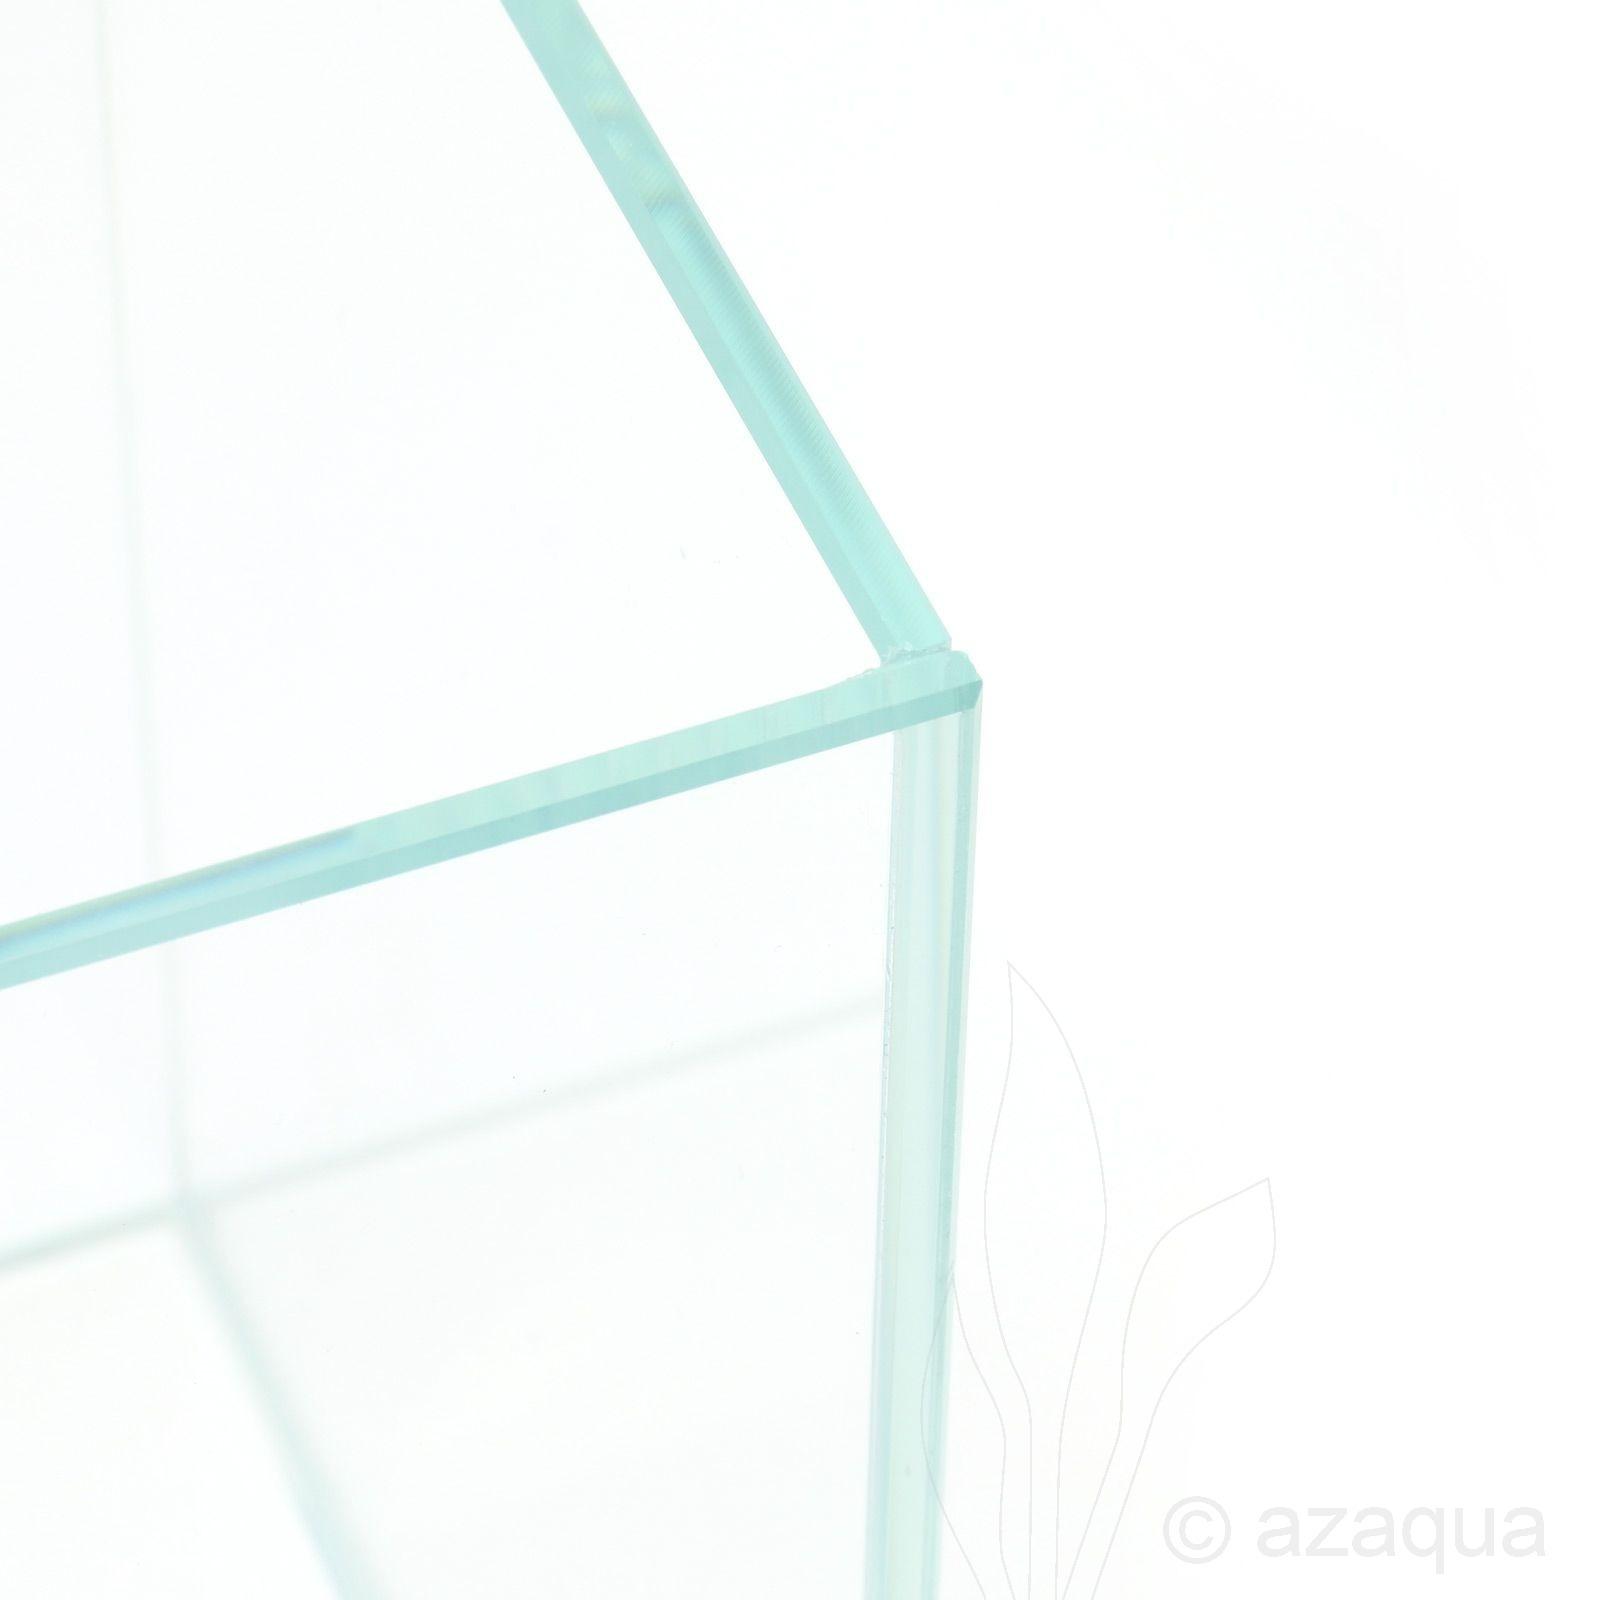 ILA Cubic (30x30x30)